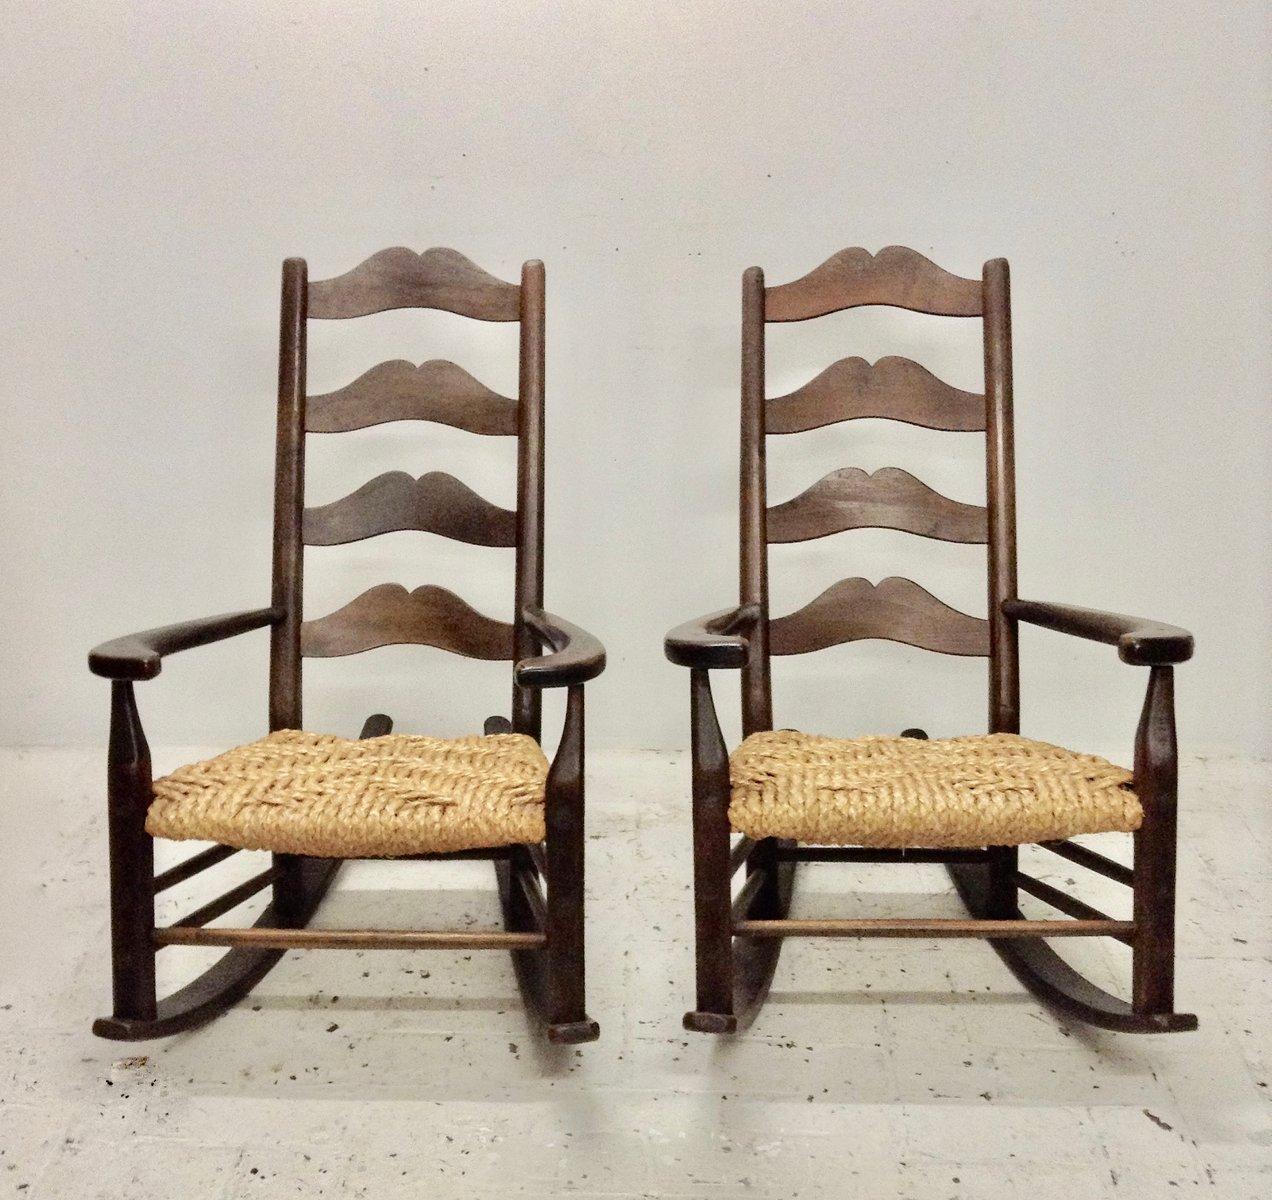 Vintage Schaukelstuhl vintage schaukelstuhl bei pamono kaufen